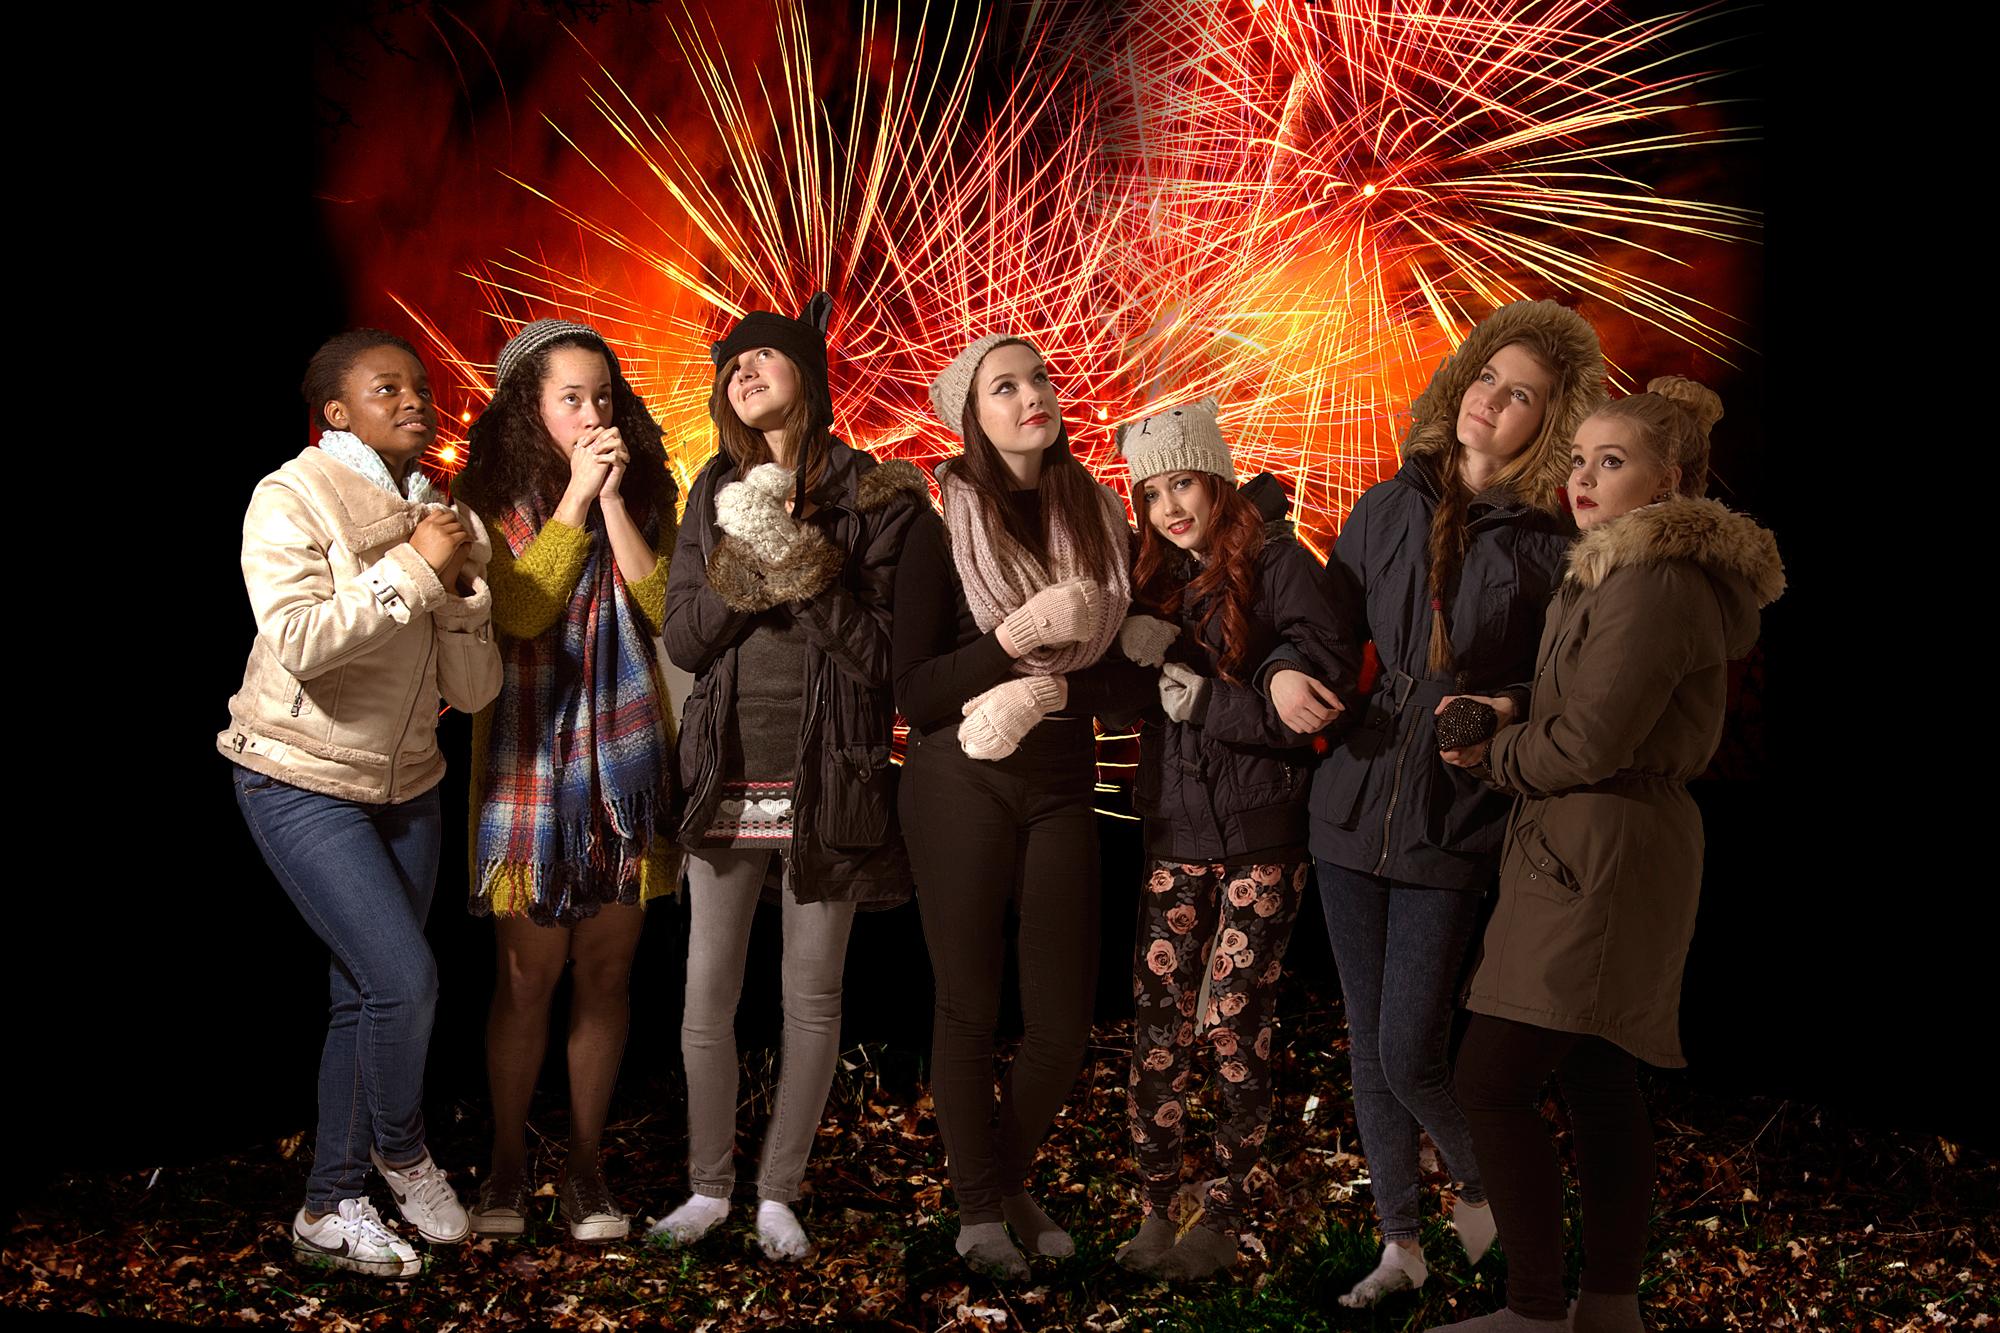 NOVEMBER: Bonfire Night